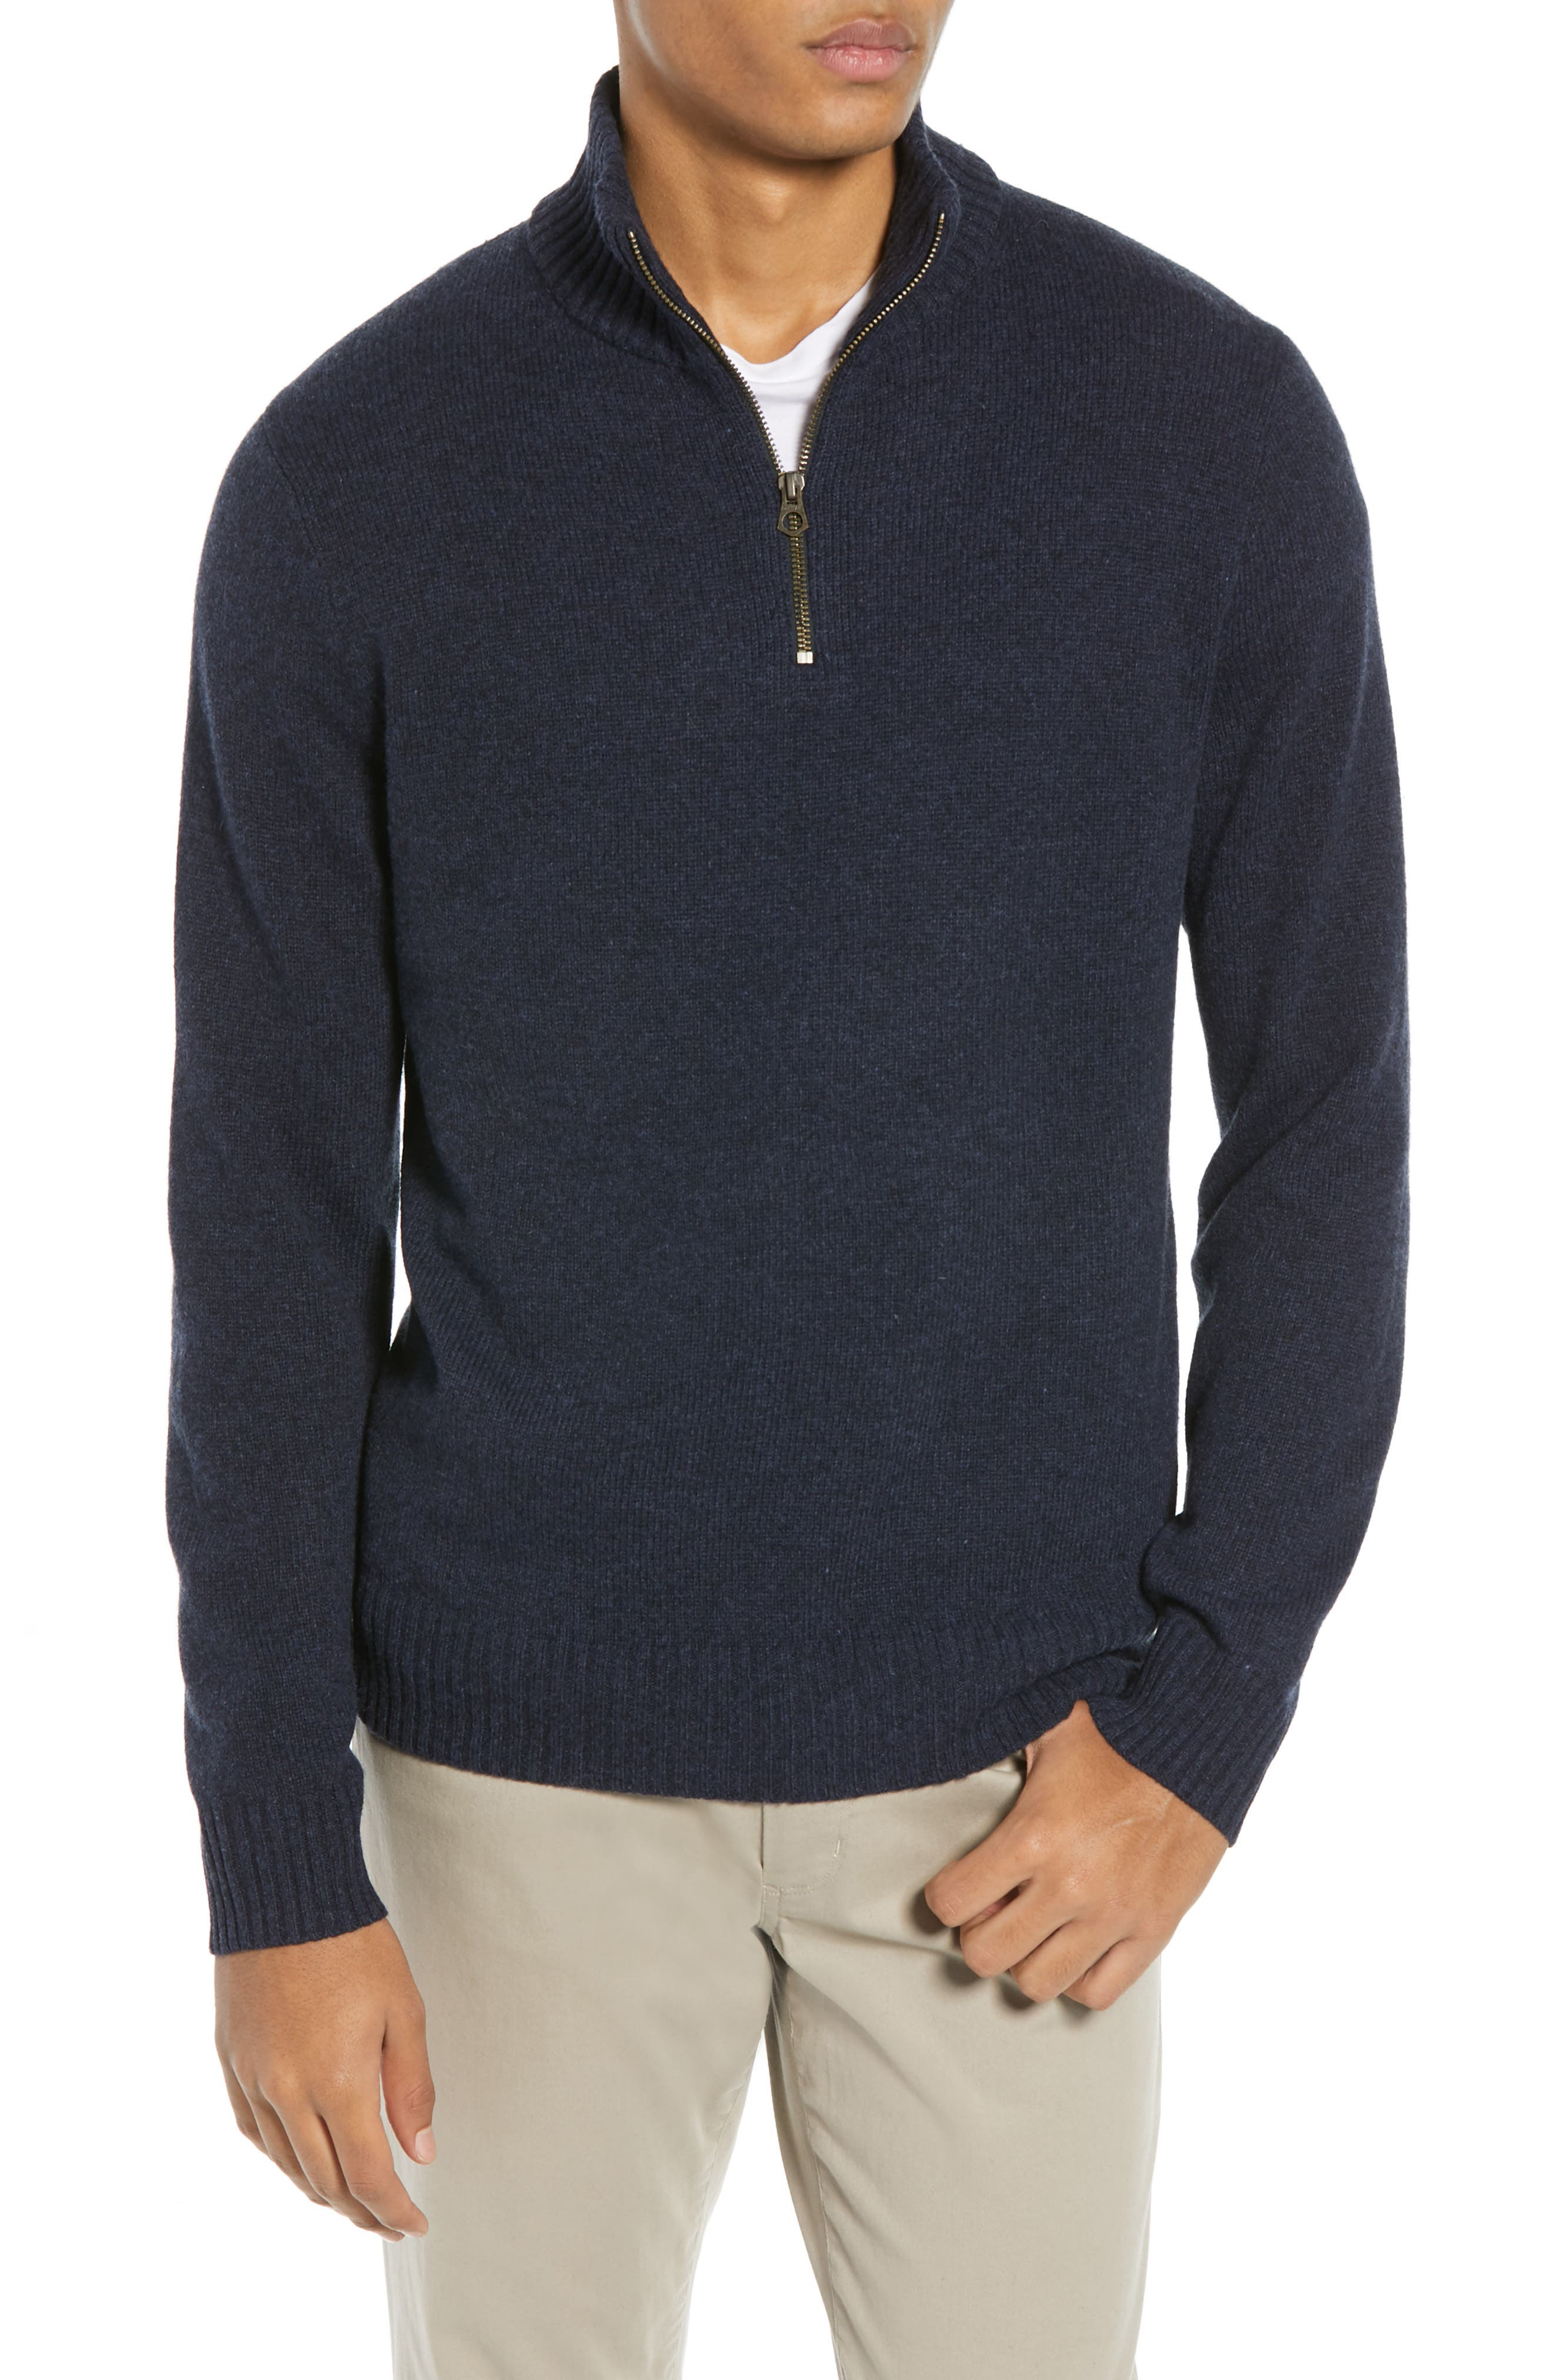 J.crew Rugged Merino Wool Blend Half Zip Sweater, Blue